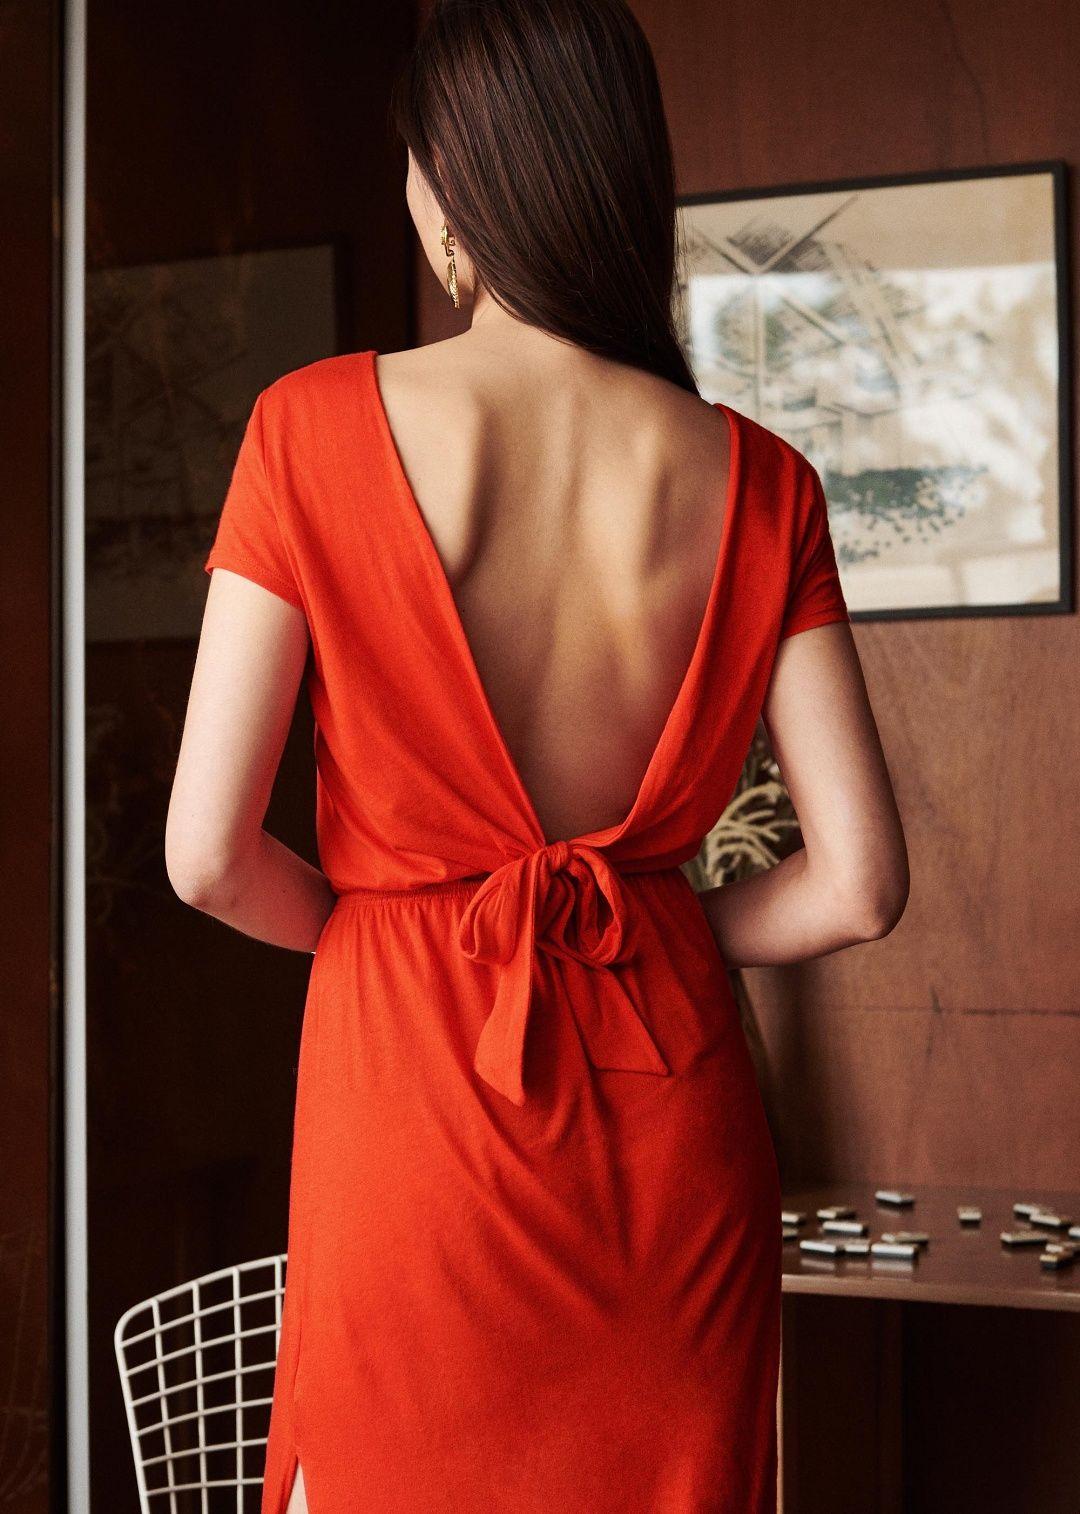 DressesEt Wrap Ideas Robe DulceSewing Dress Sézane FlKc1J